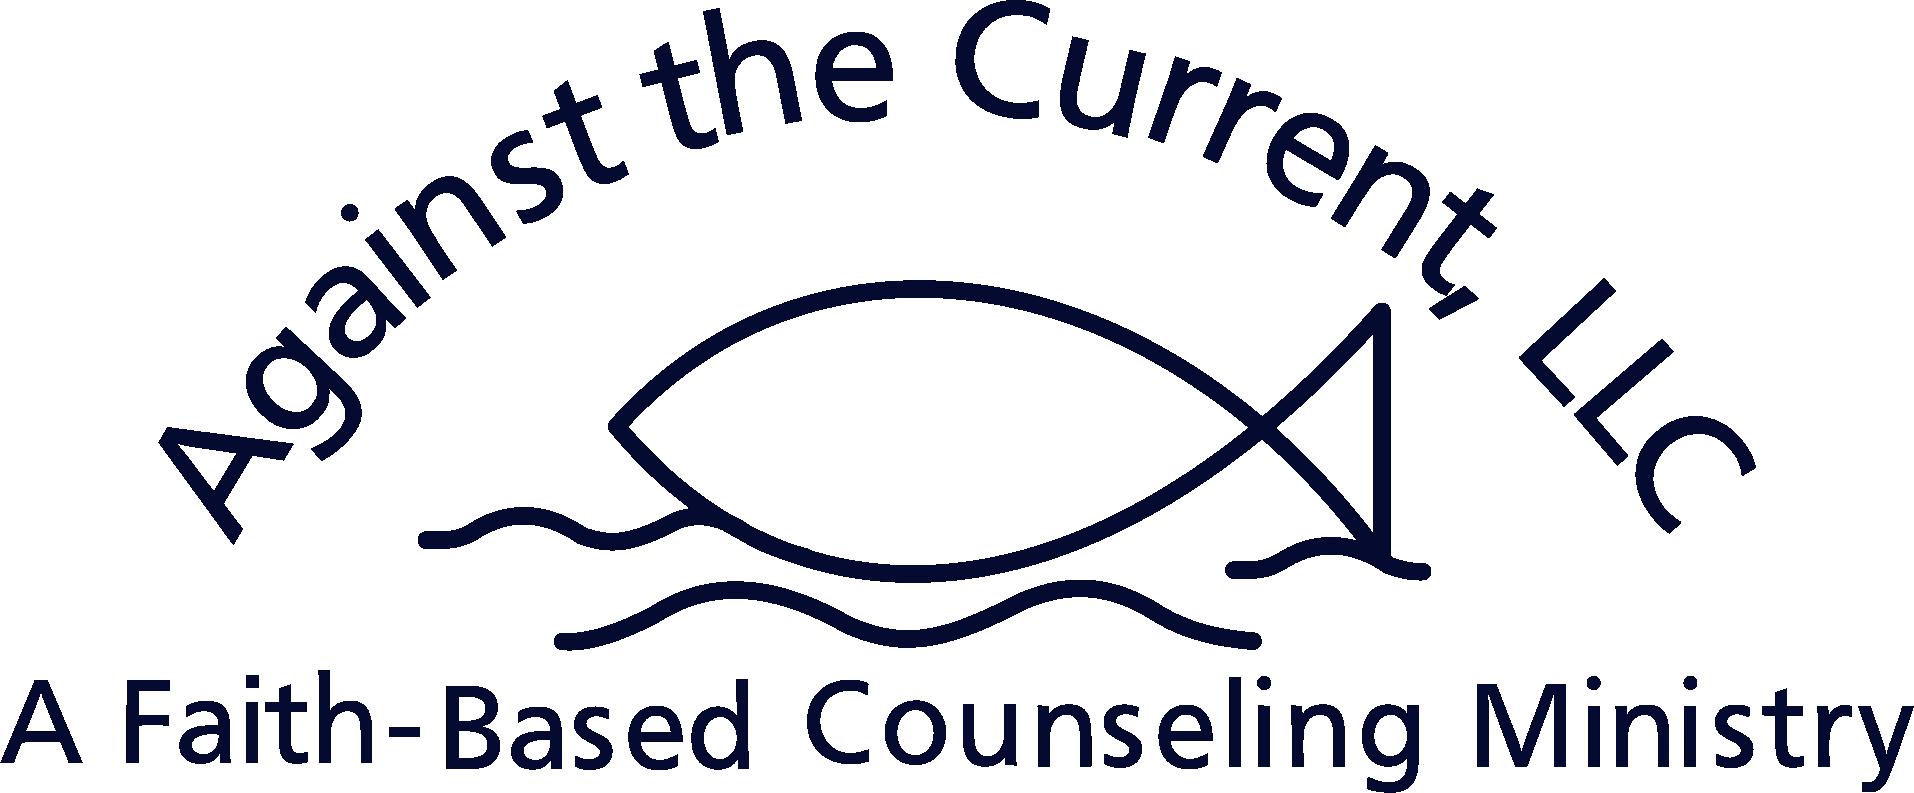 ATCM Counseling